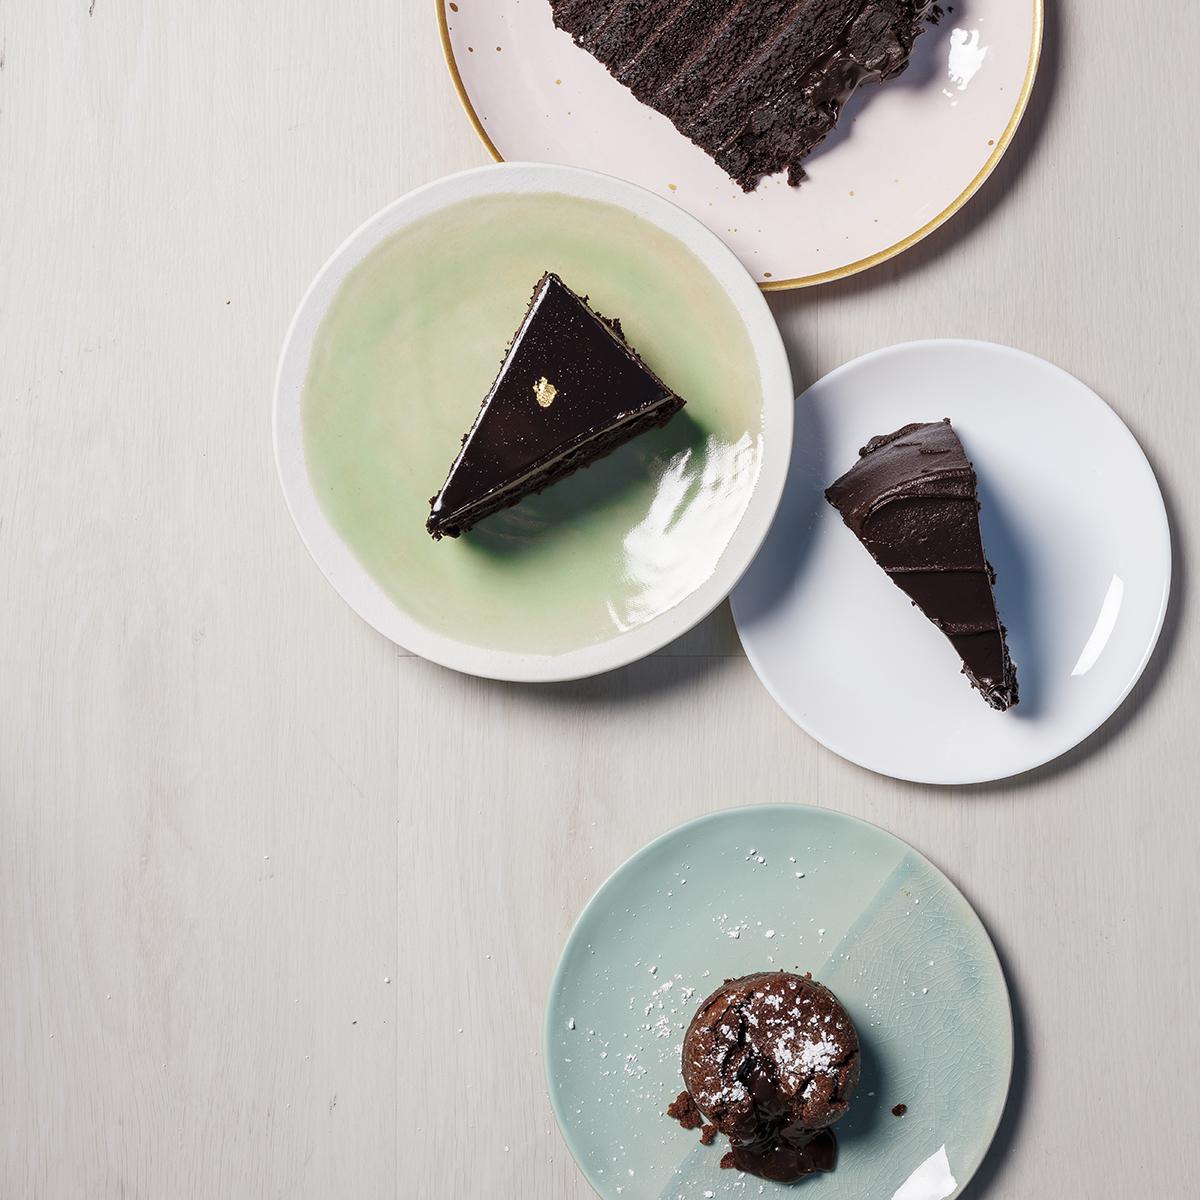 Chocolate Cake Best Dessert November Toc